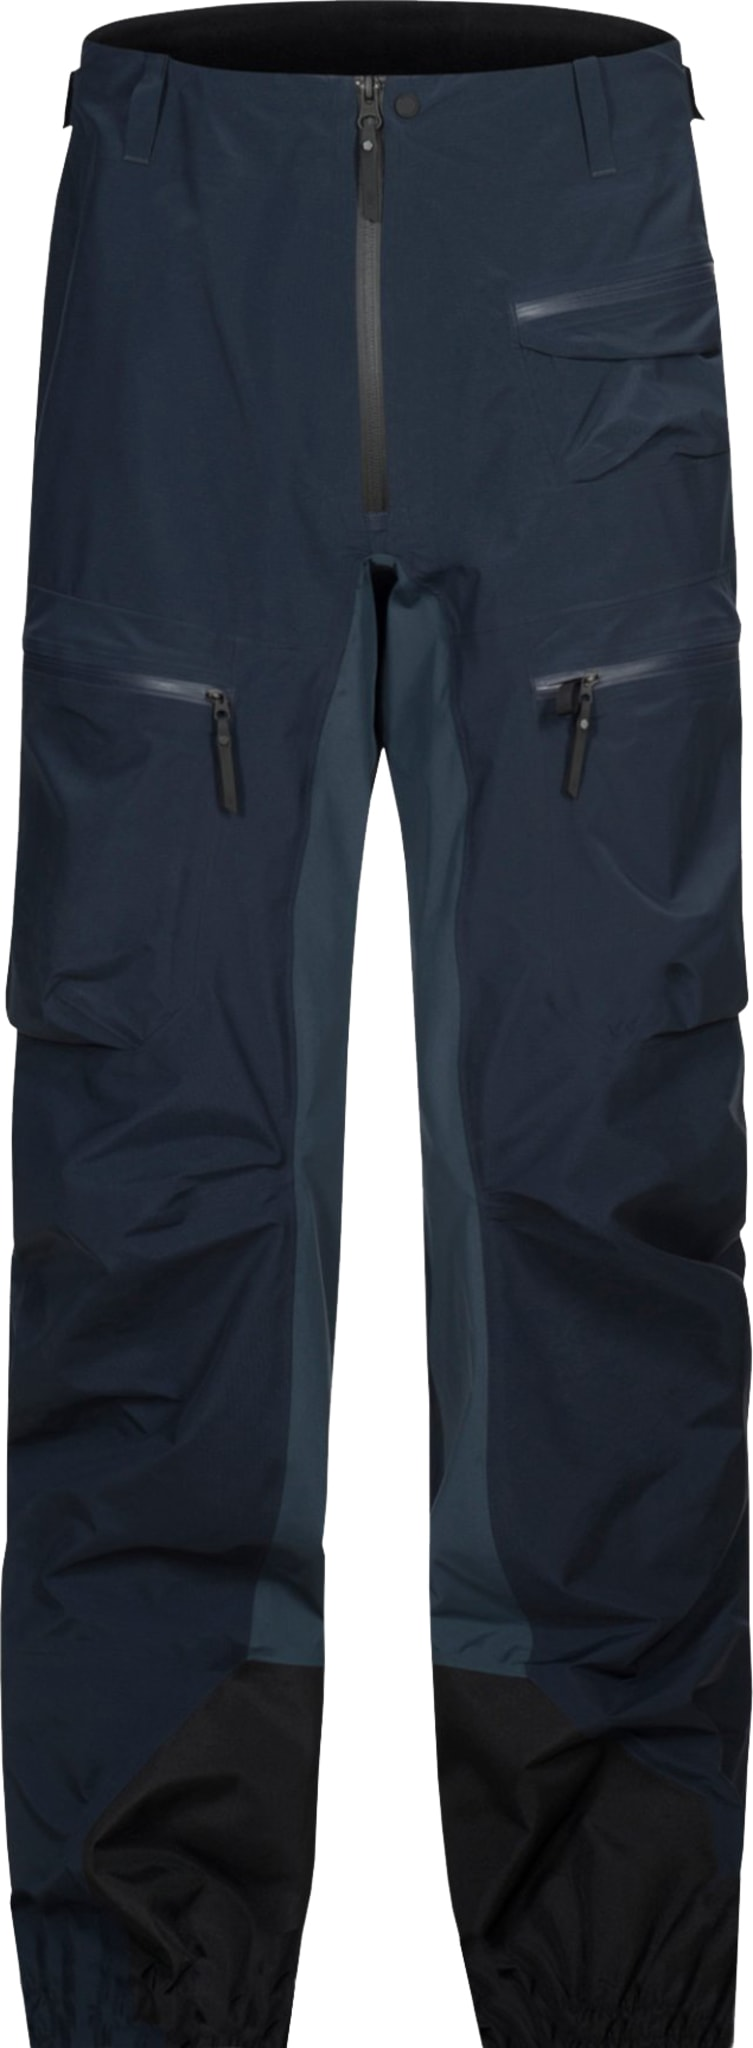 Vislight Pants M